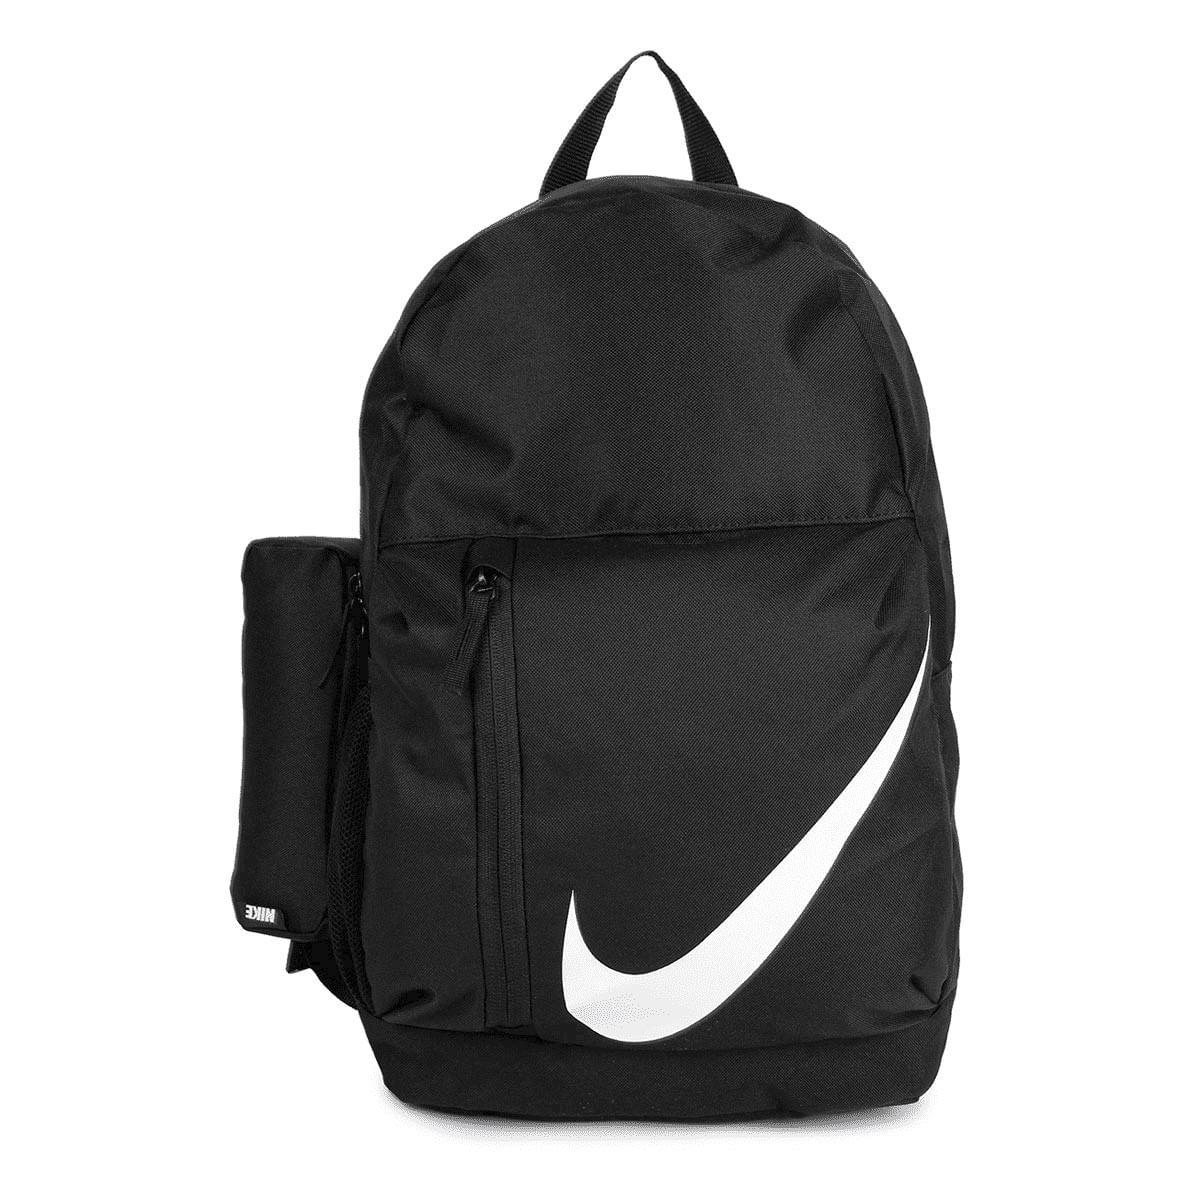 Mochila-Infantil-Nike-Elemental